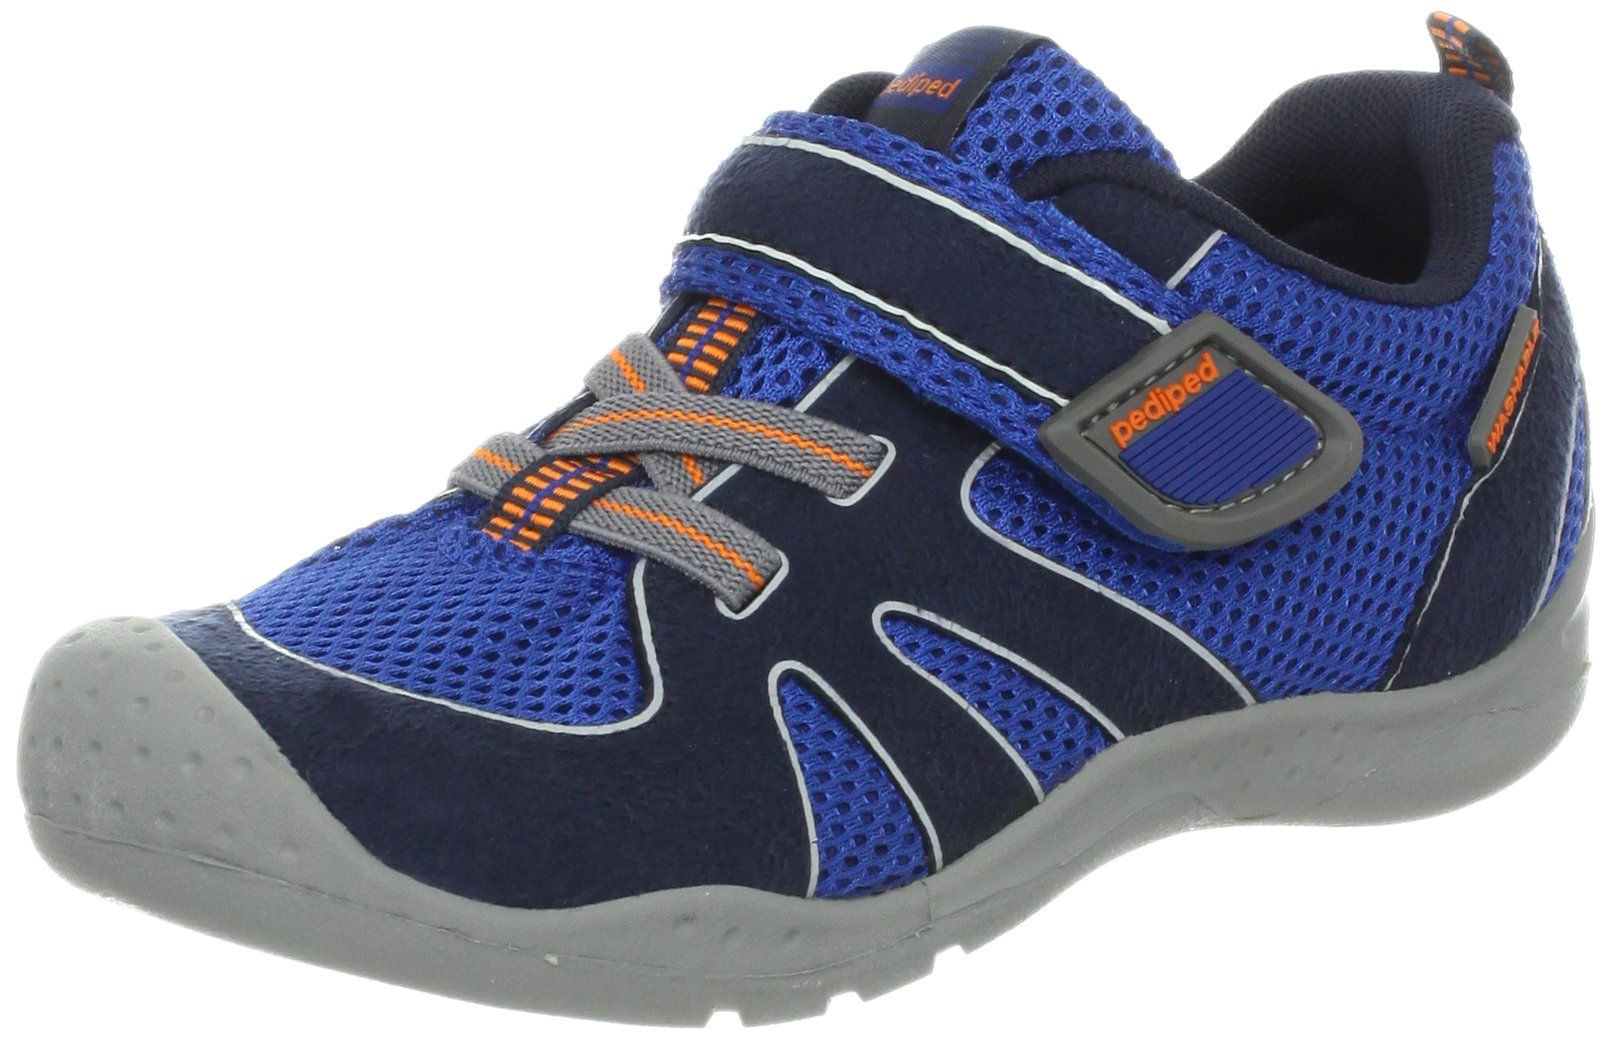 pediped Flex Rio Water Shoe (Toddler/Little Kid),Nittany Blue/Orange,33 EU (1.5-2 E US Little Kid)